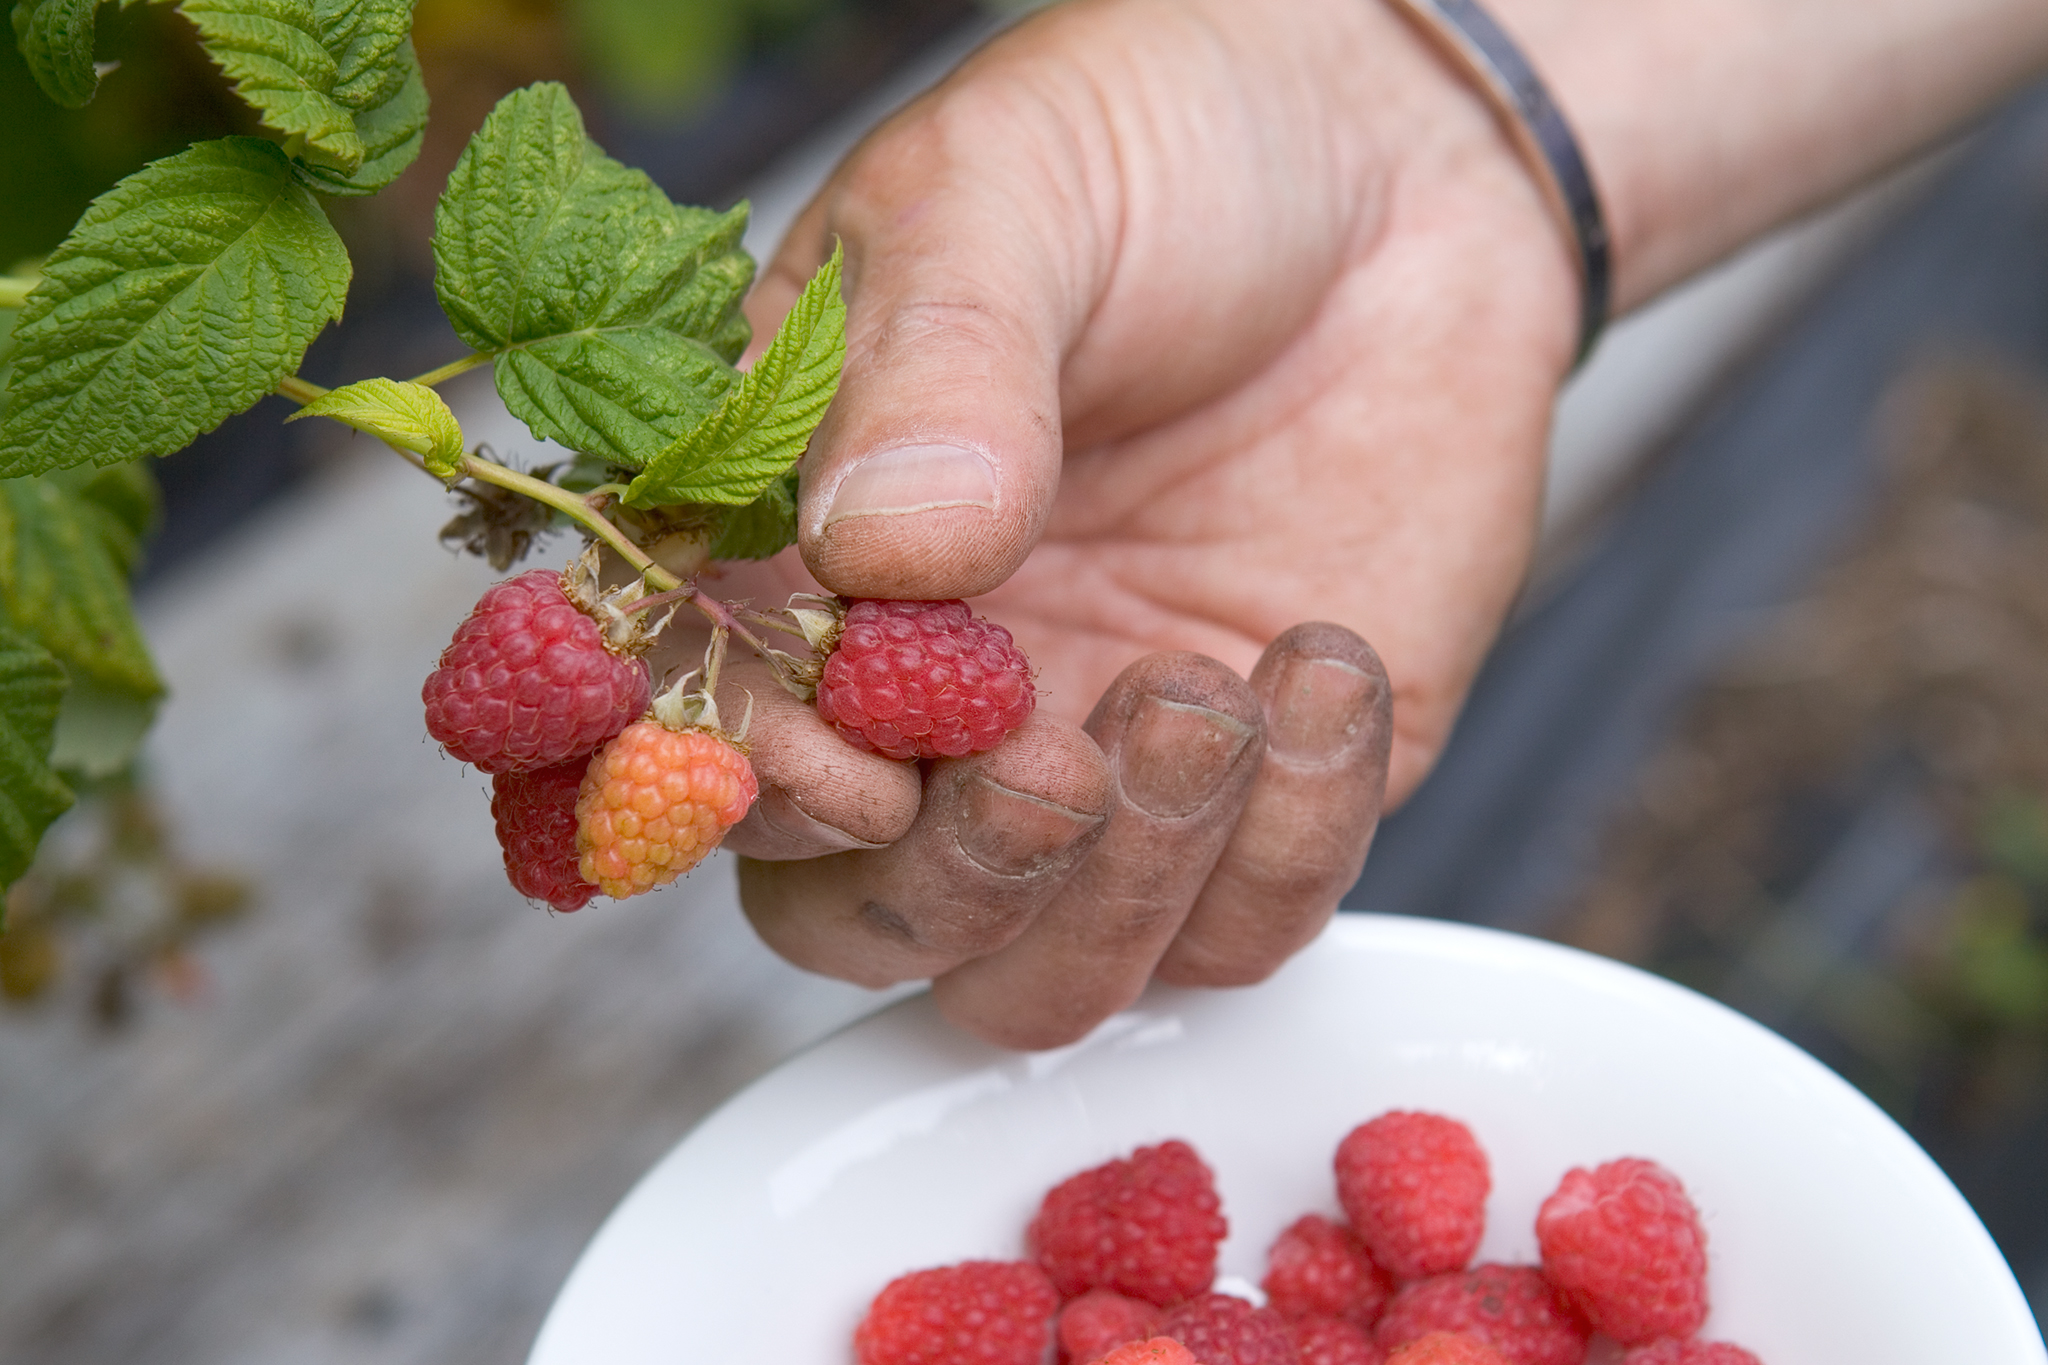 picking-raspberries-4